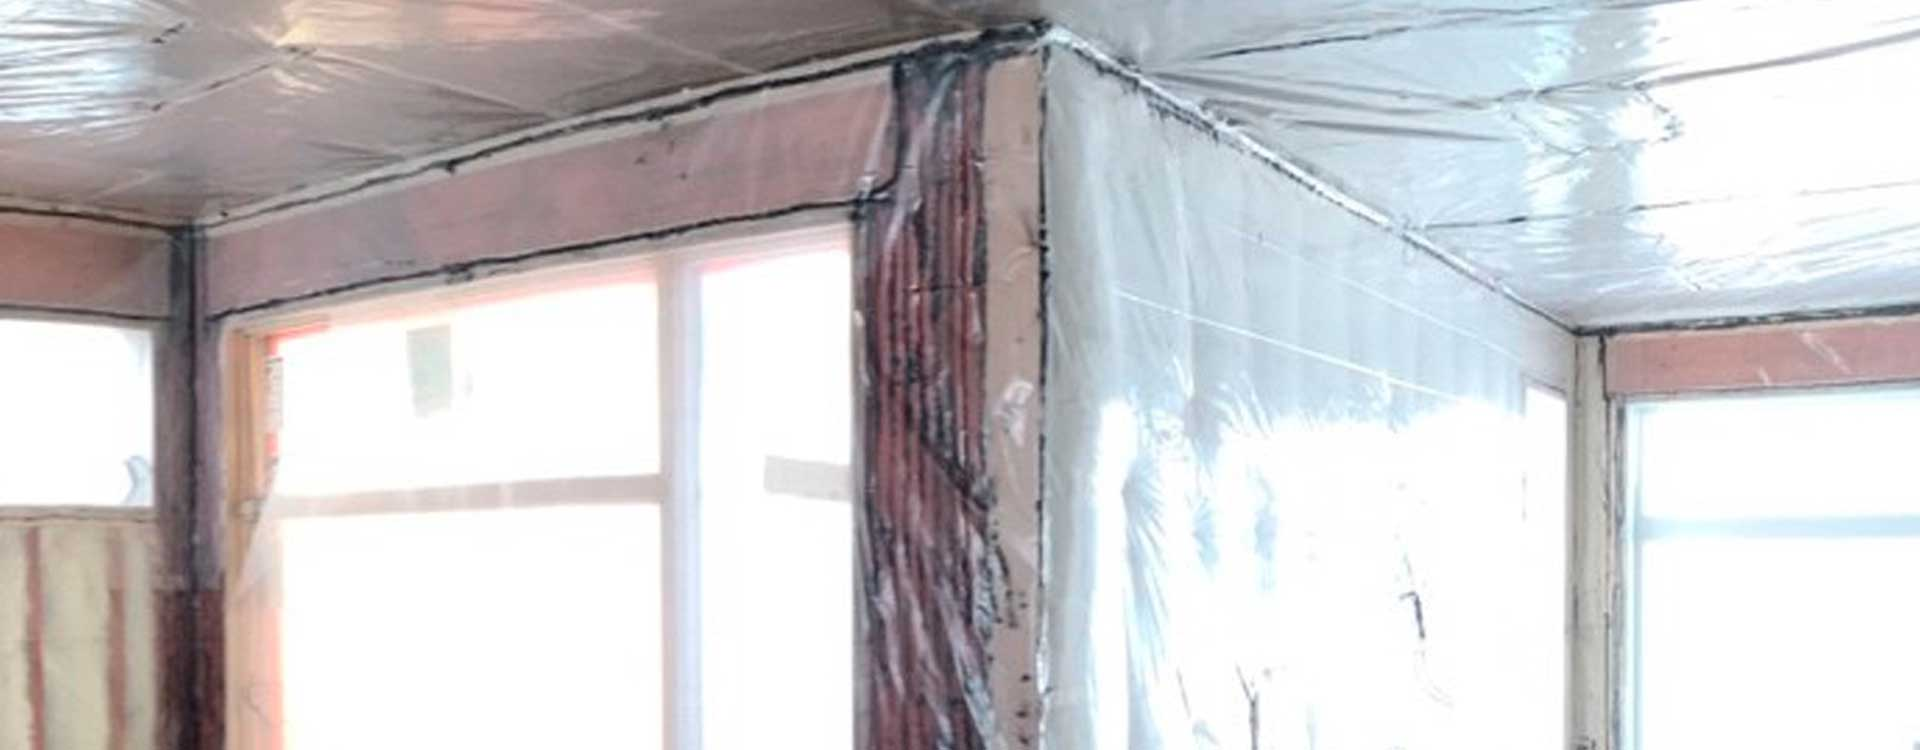 edmonton-home-builder-Kanvi-building-wrap